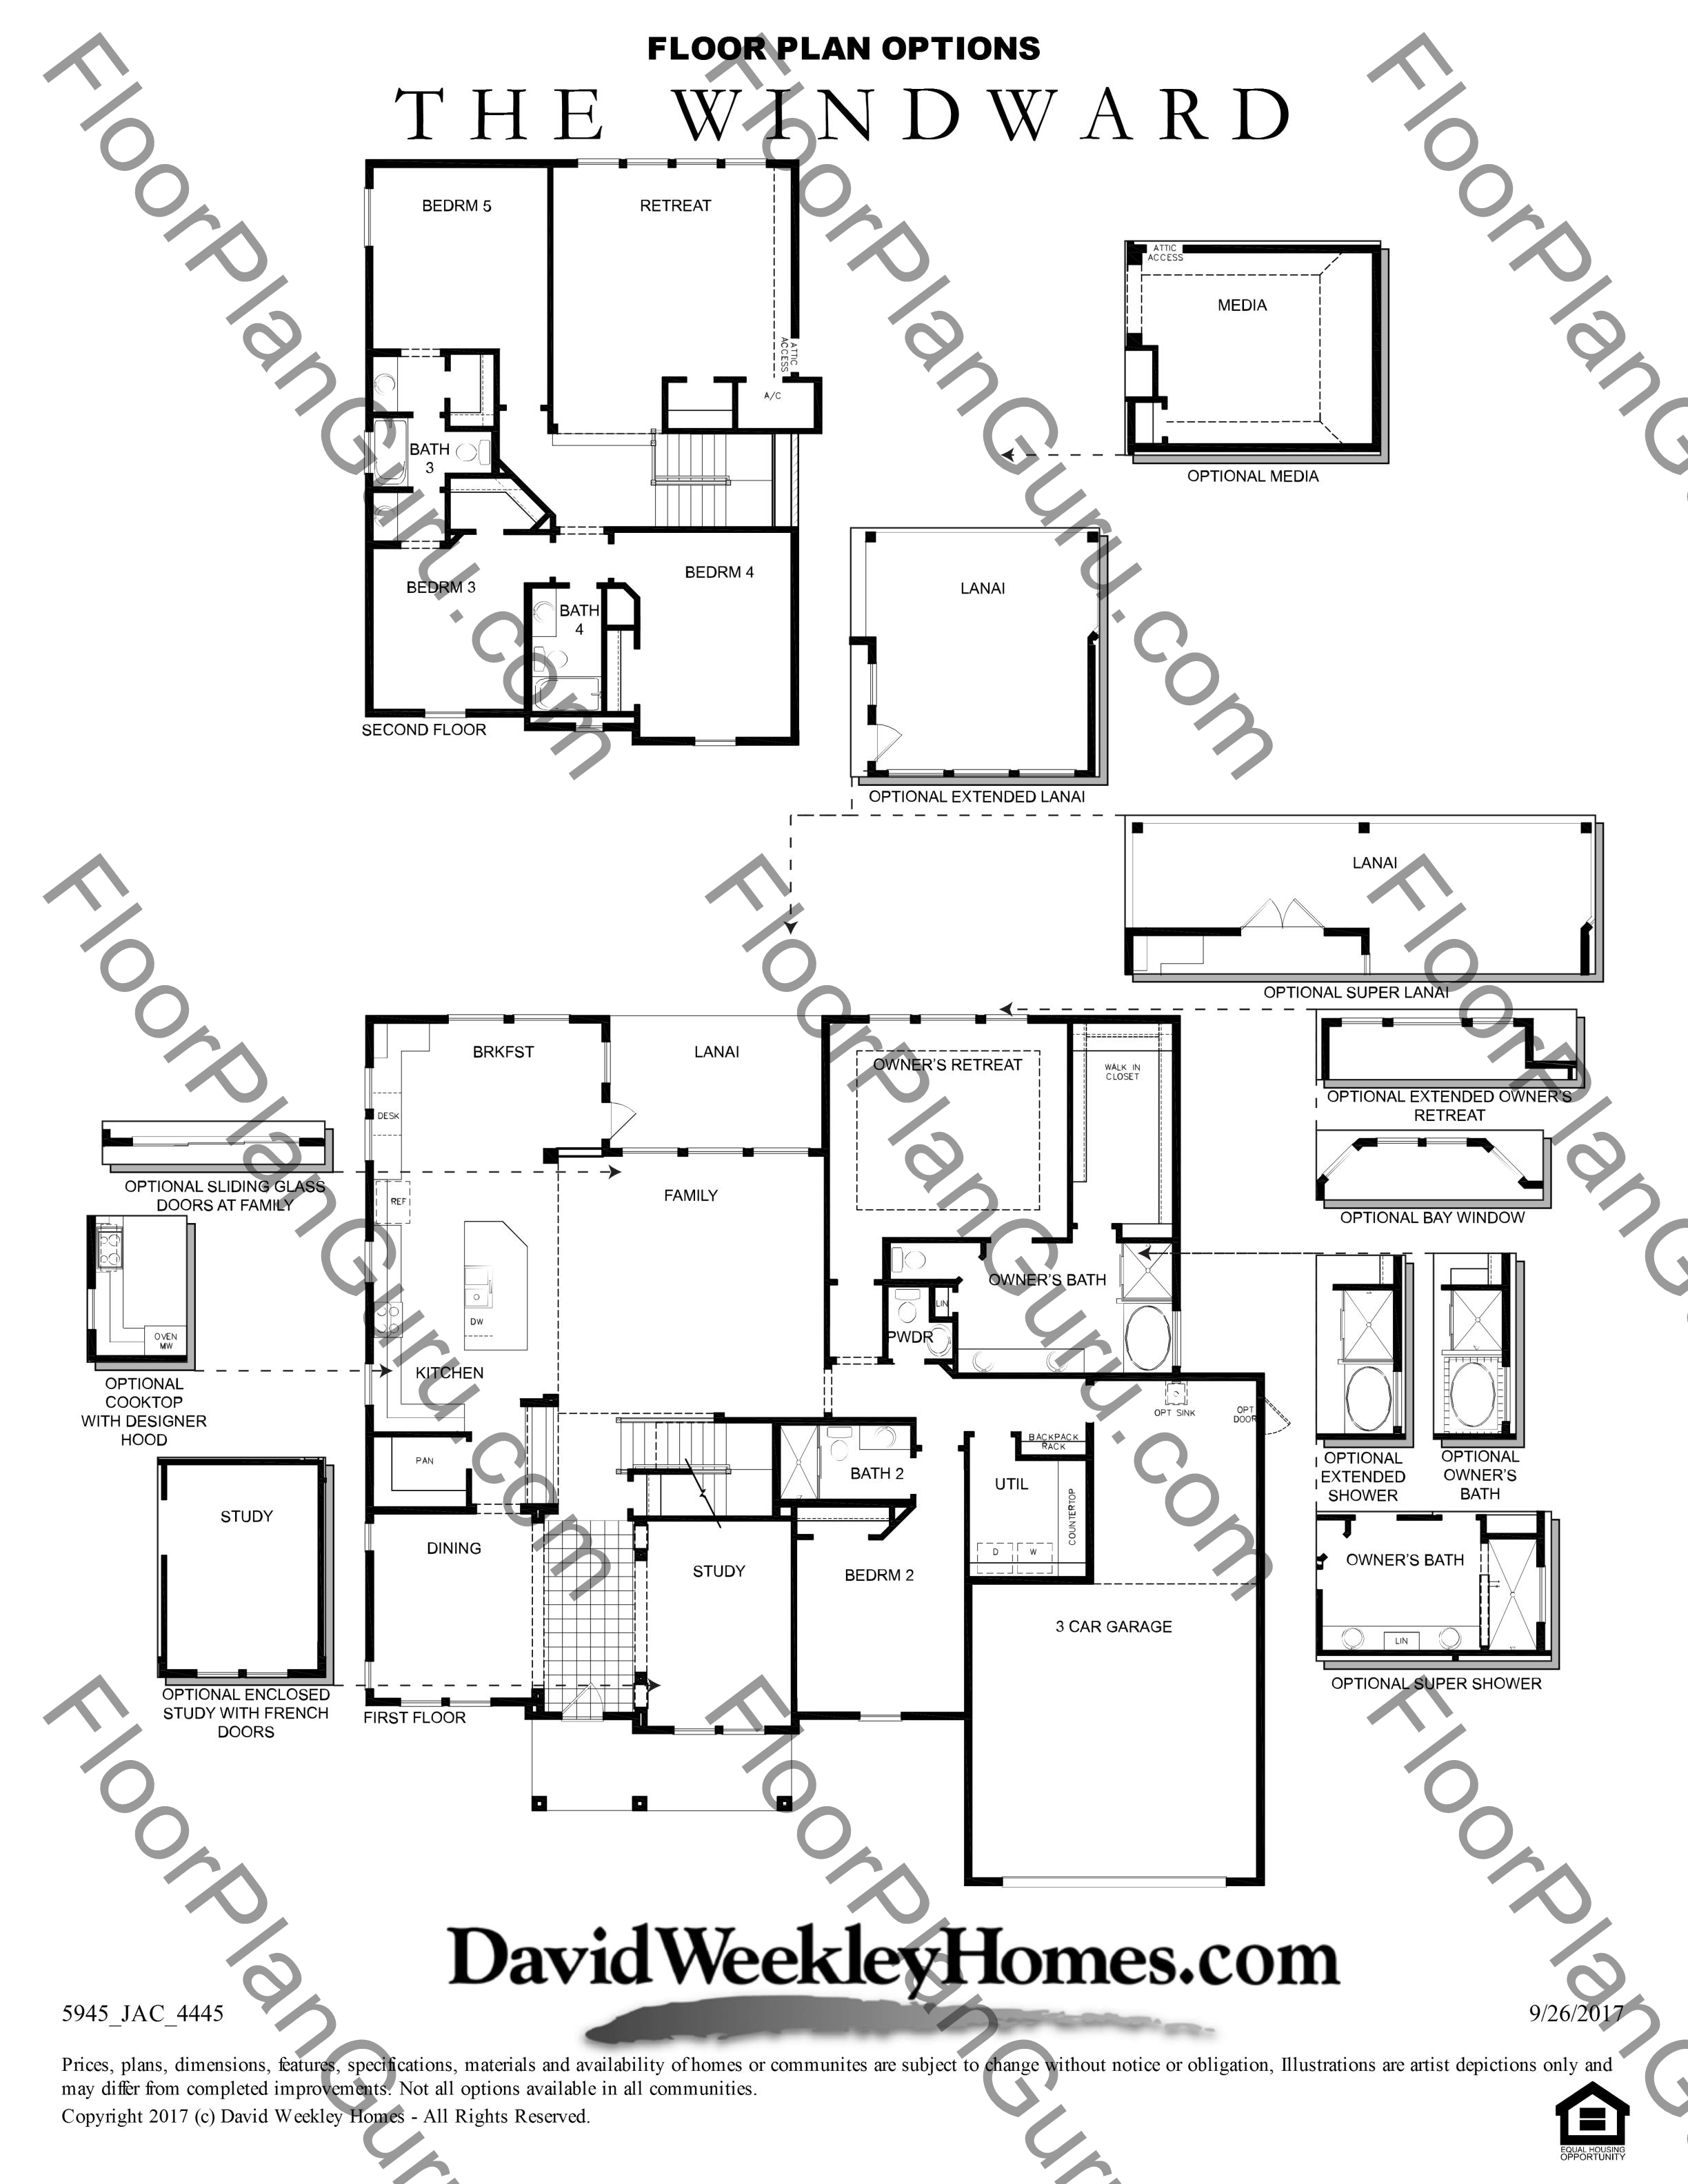 The Windward Floorplan By David Weekley Homes Oxford Estates In Jacksonville Florida Welcome To Floorplanguru Com